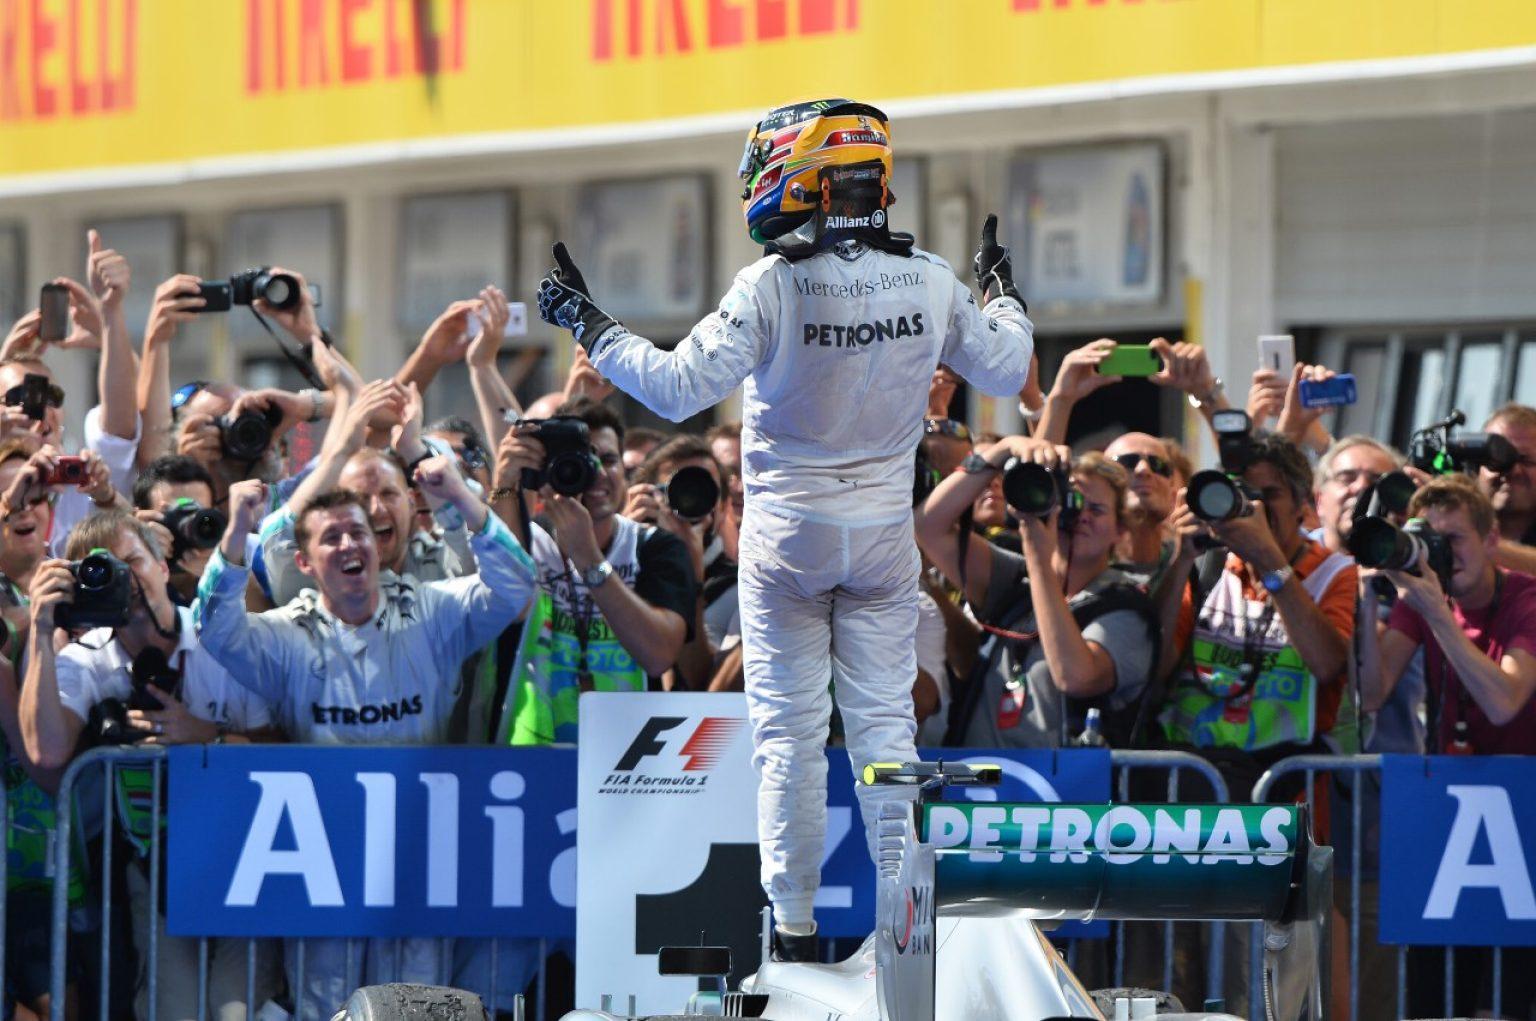 England vs Germany. Mercedes vs Mercedes. Hamilton vs Rosberg. Who will triumph?